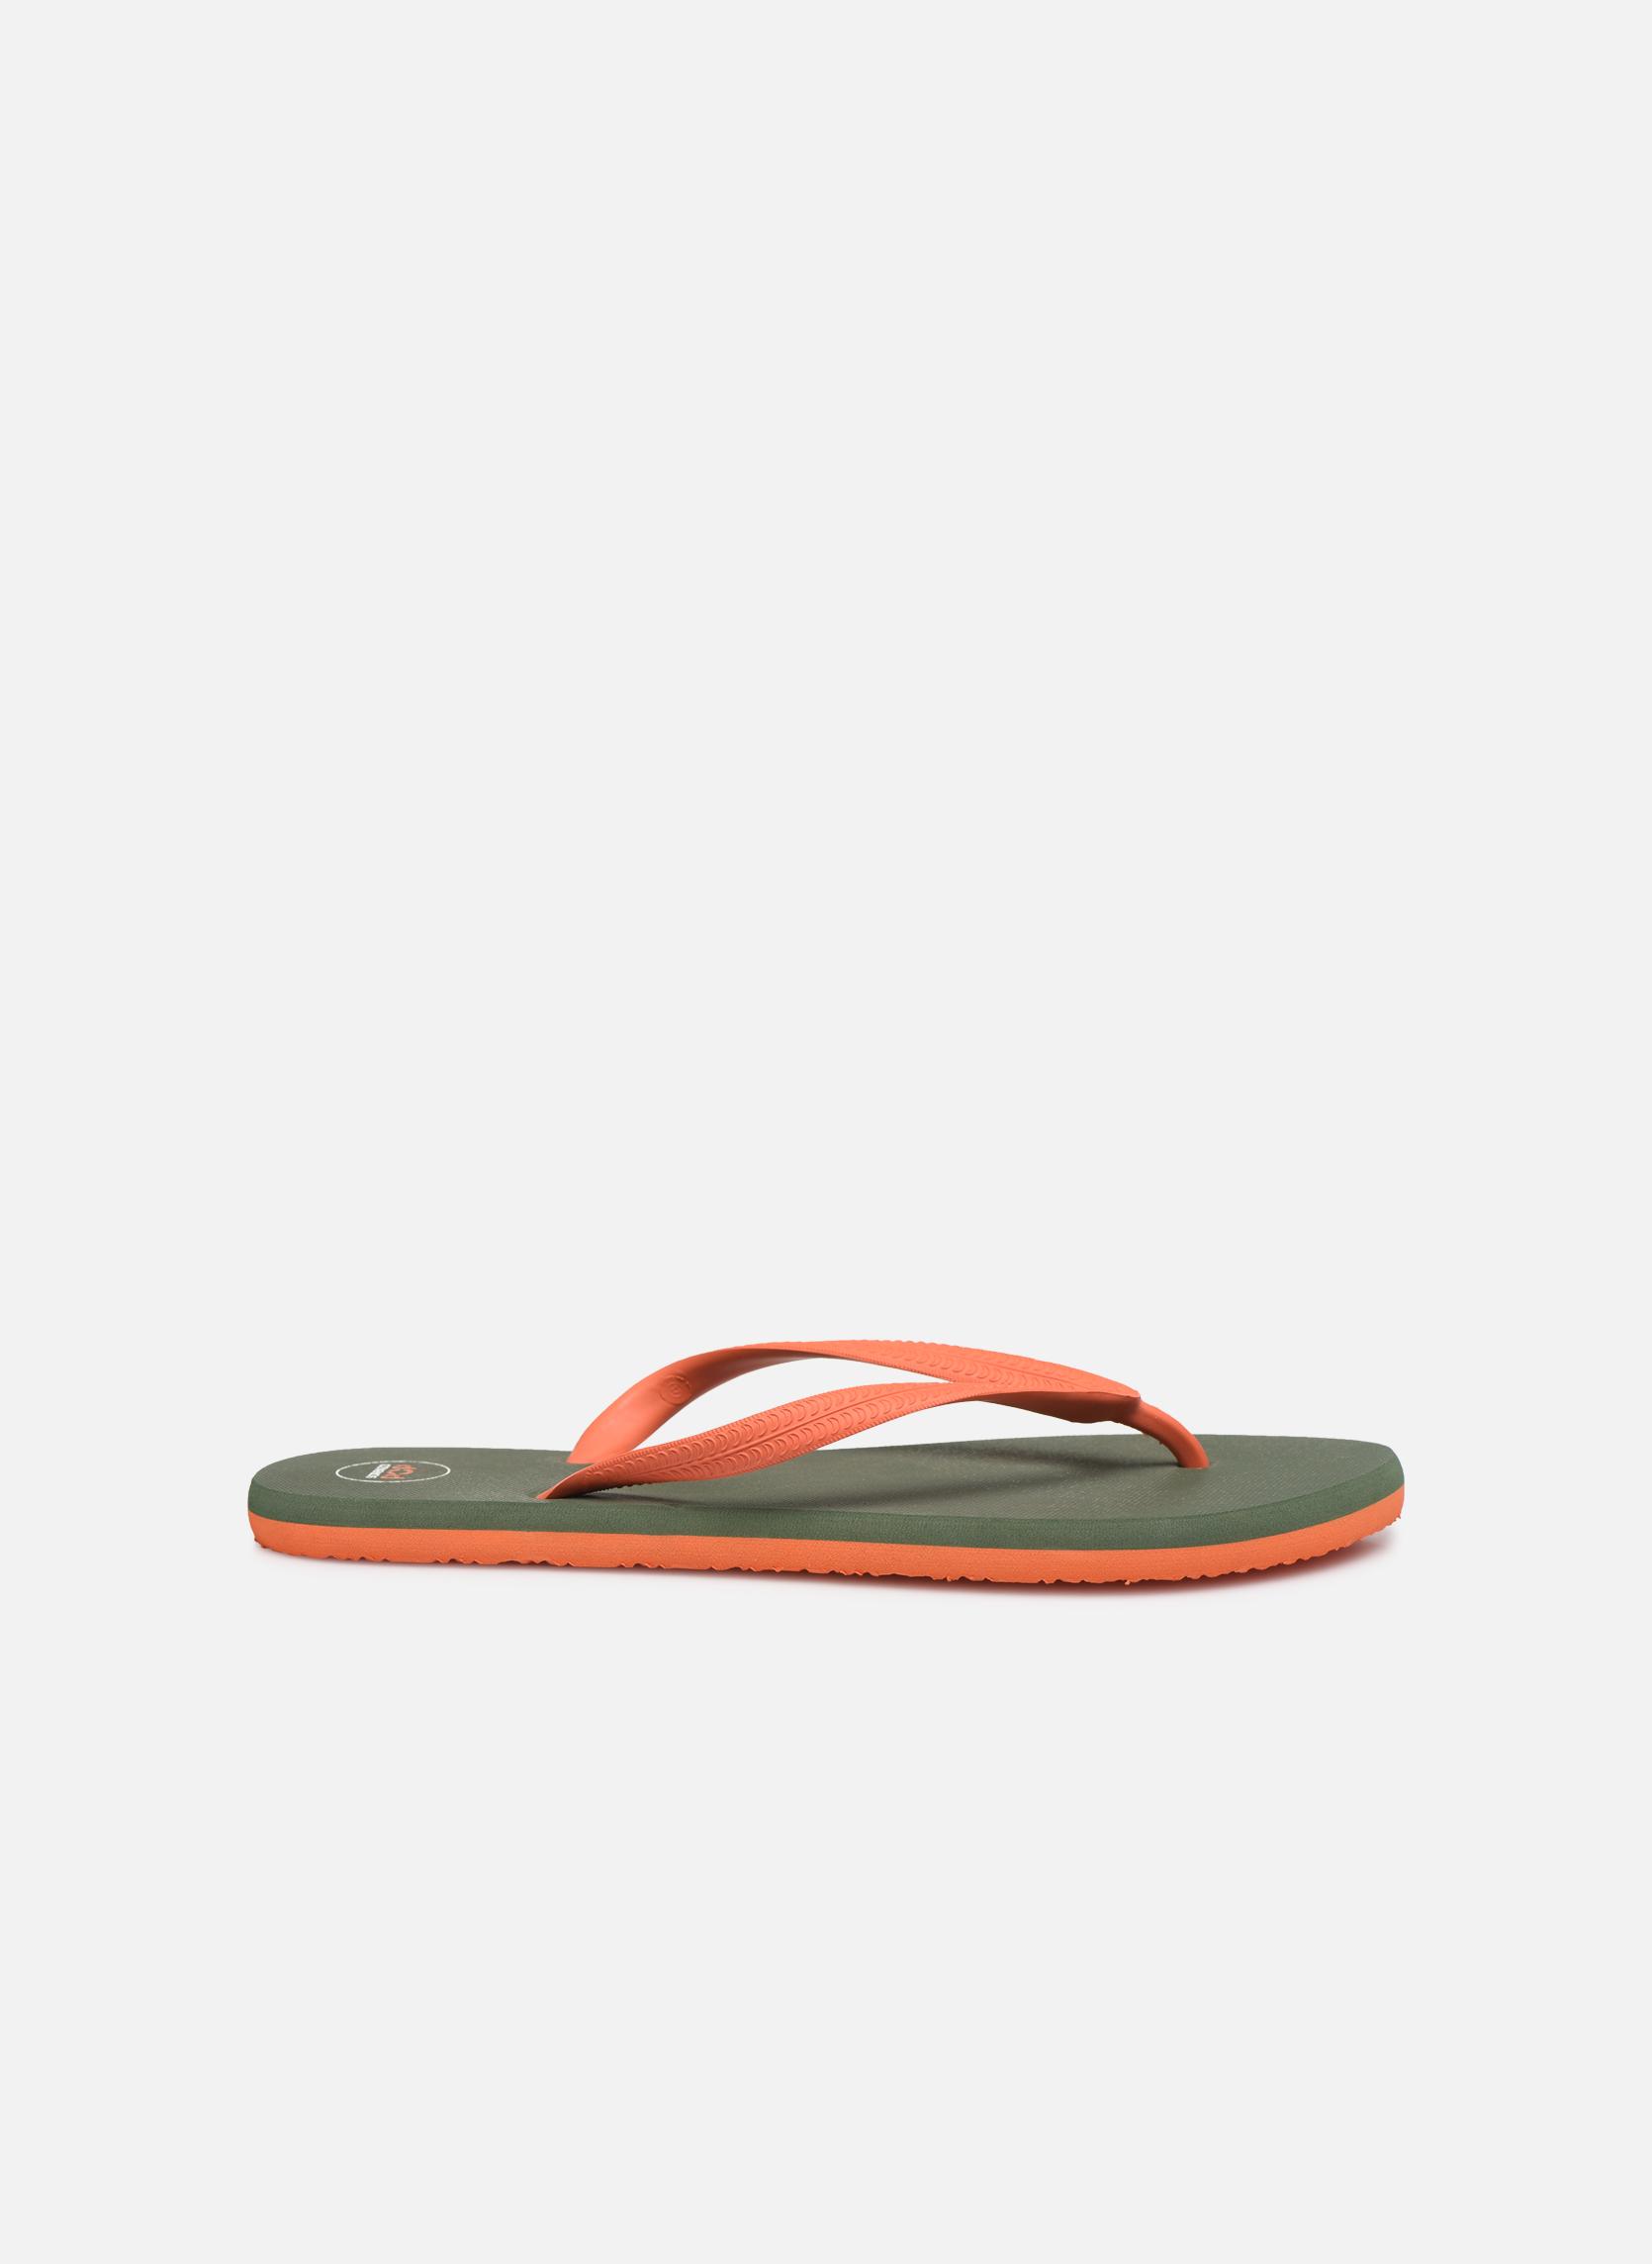 Marques Chaussure homme SARENZA POP homme Diya M Tong  Flip Flop Orange /kaki 5925